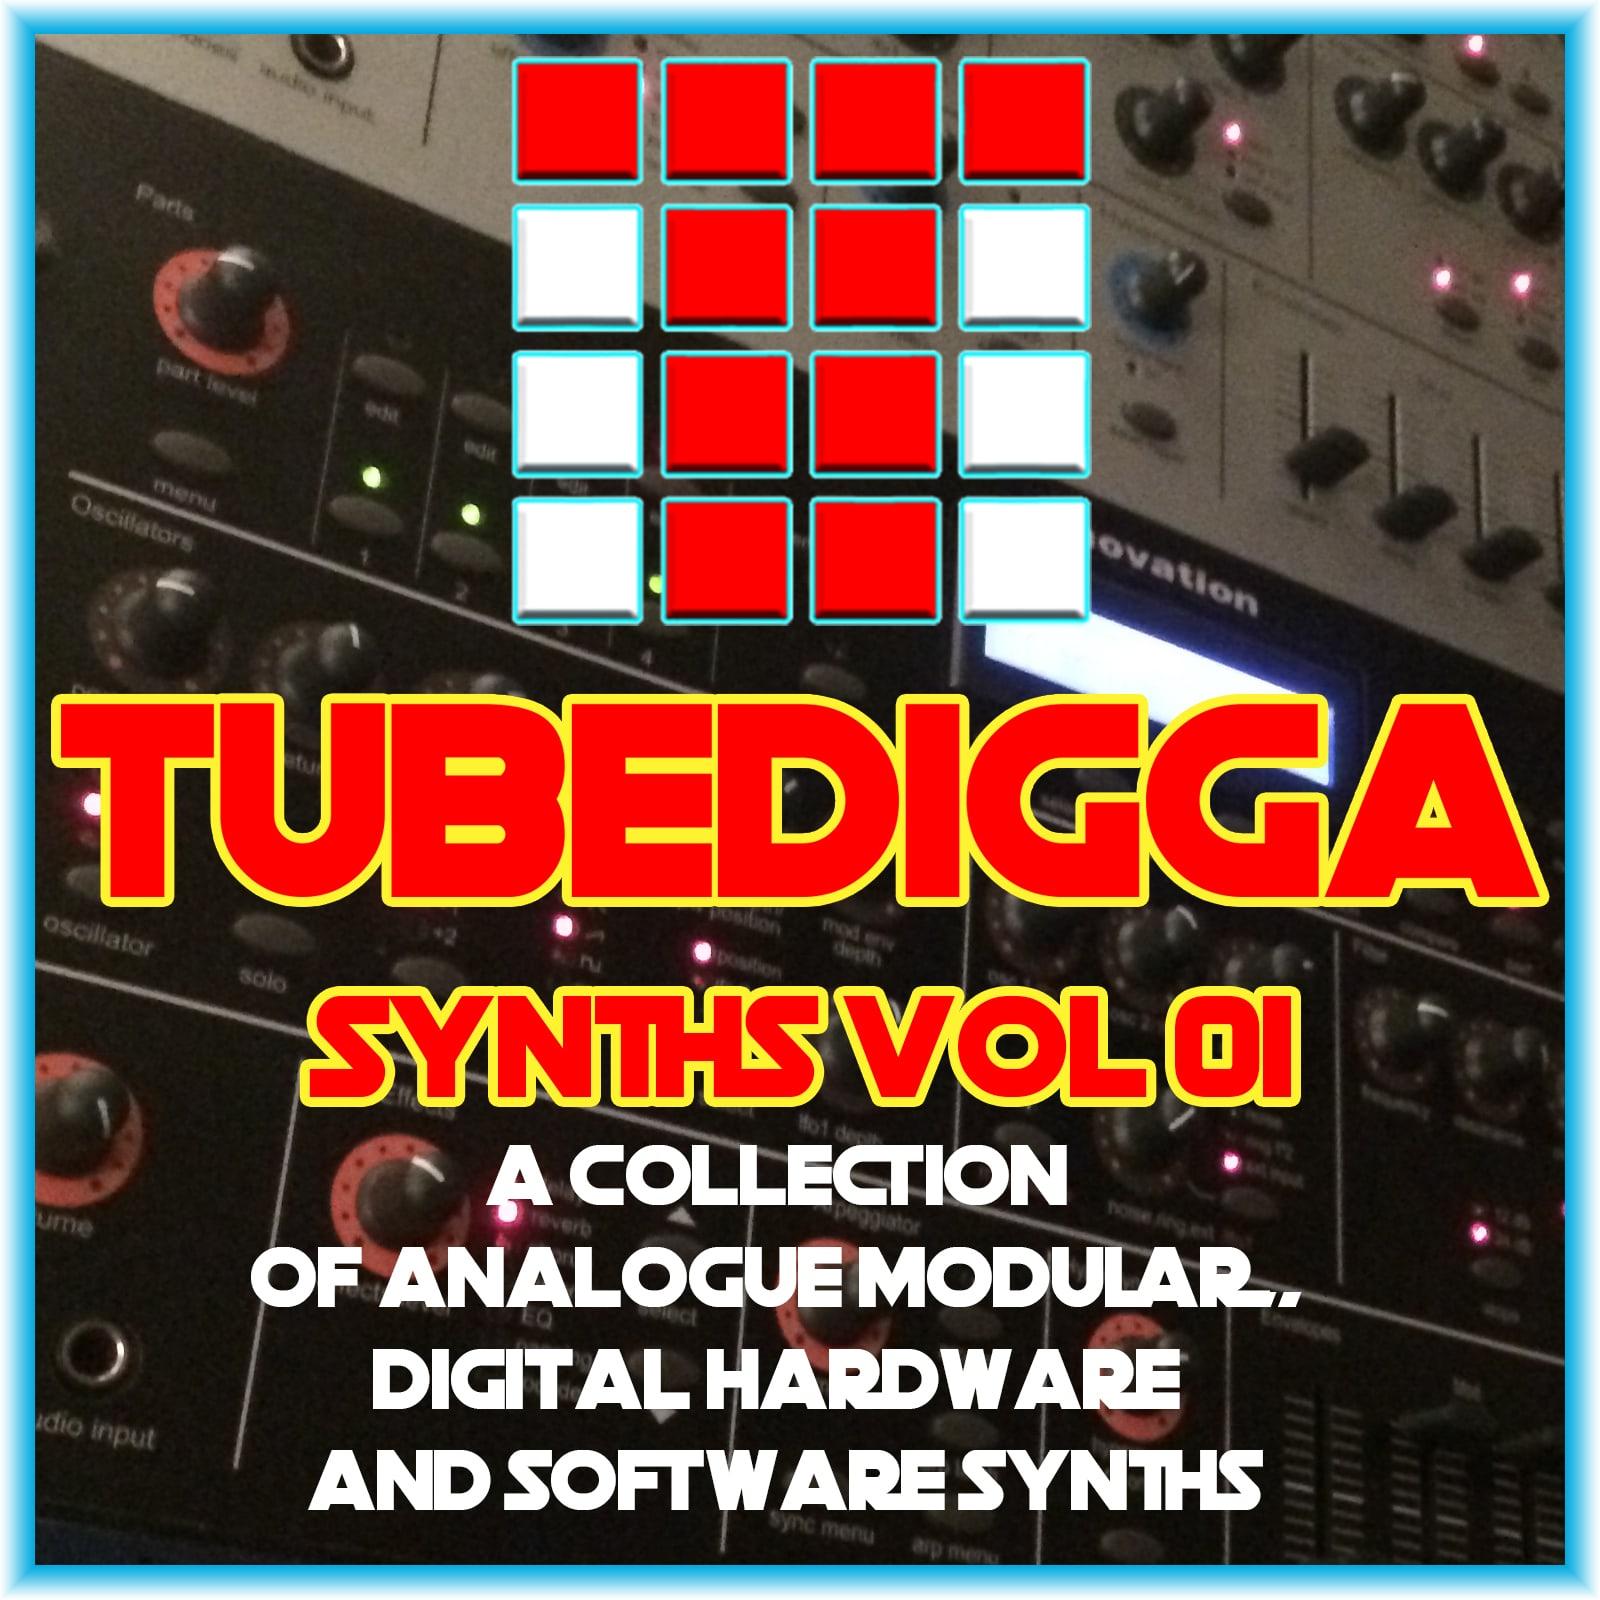 TUBEDIGGA SYNTHS VOL 01